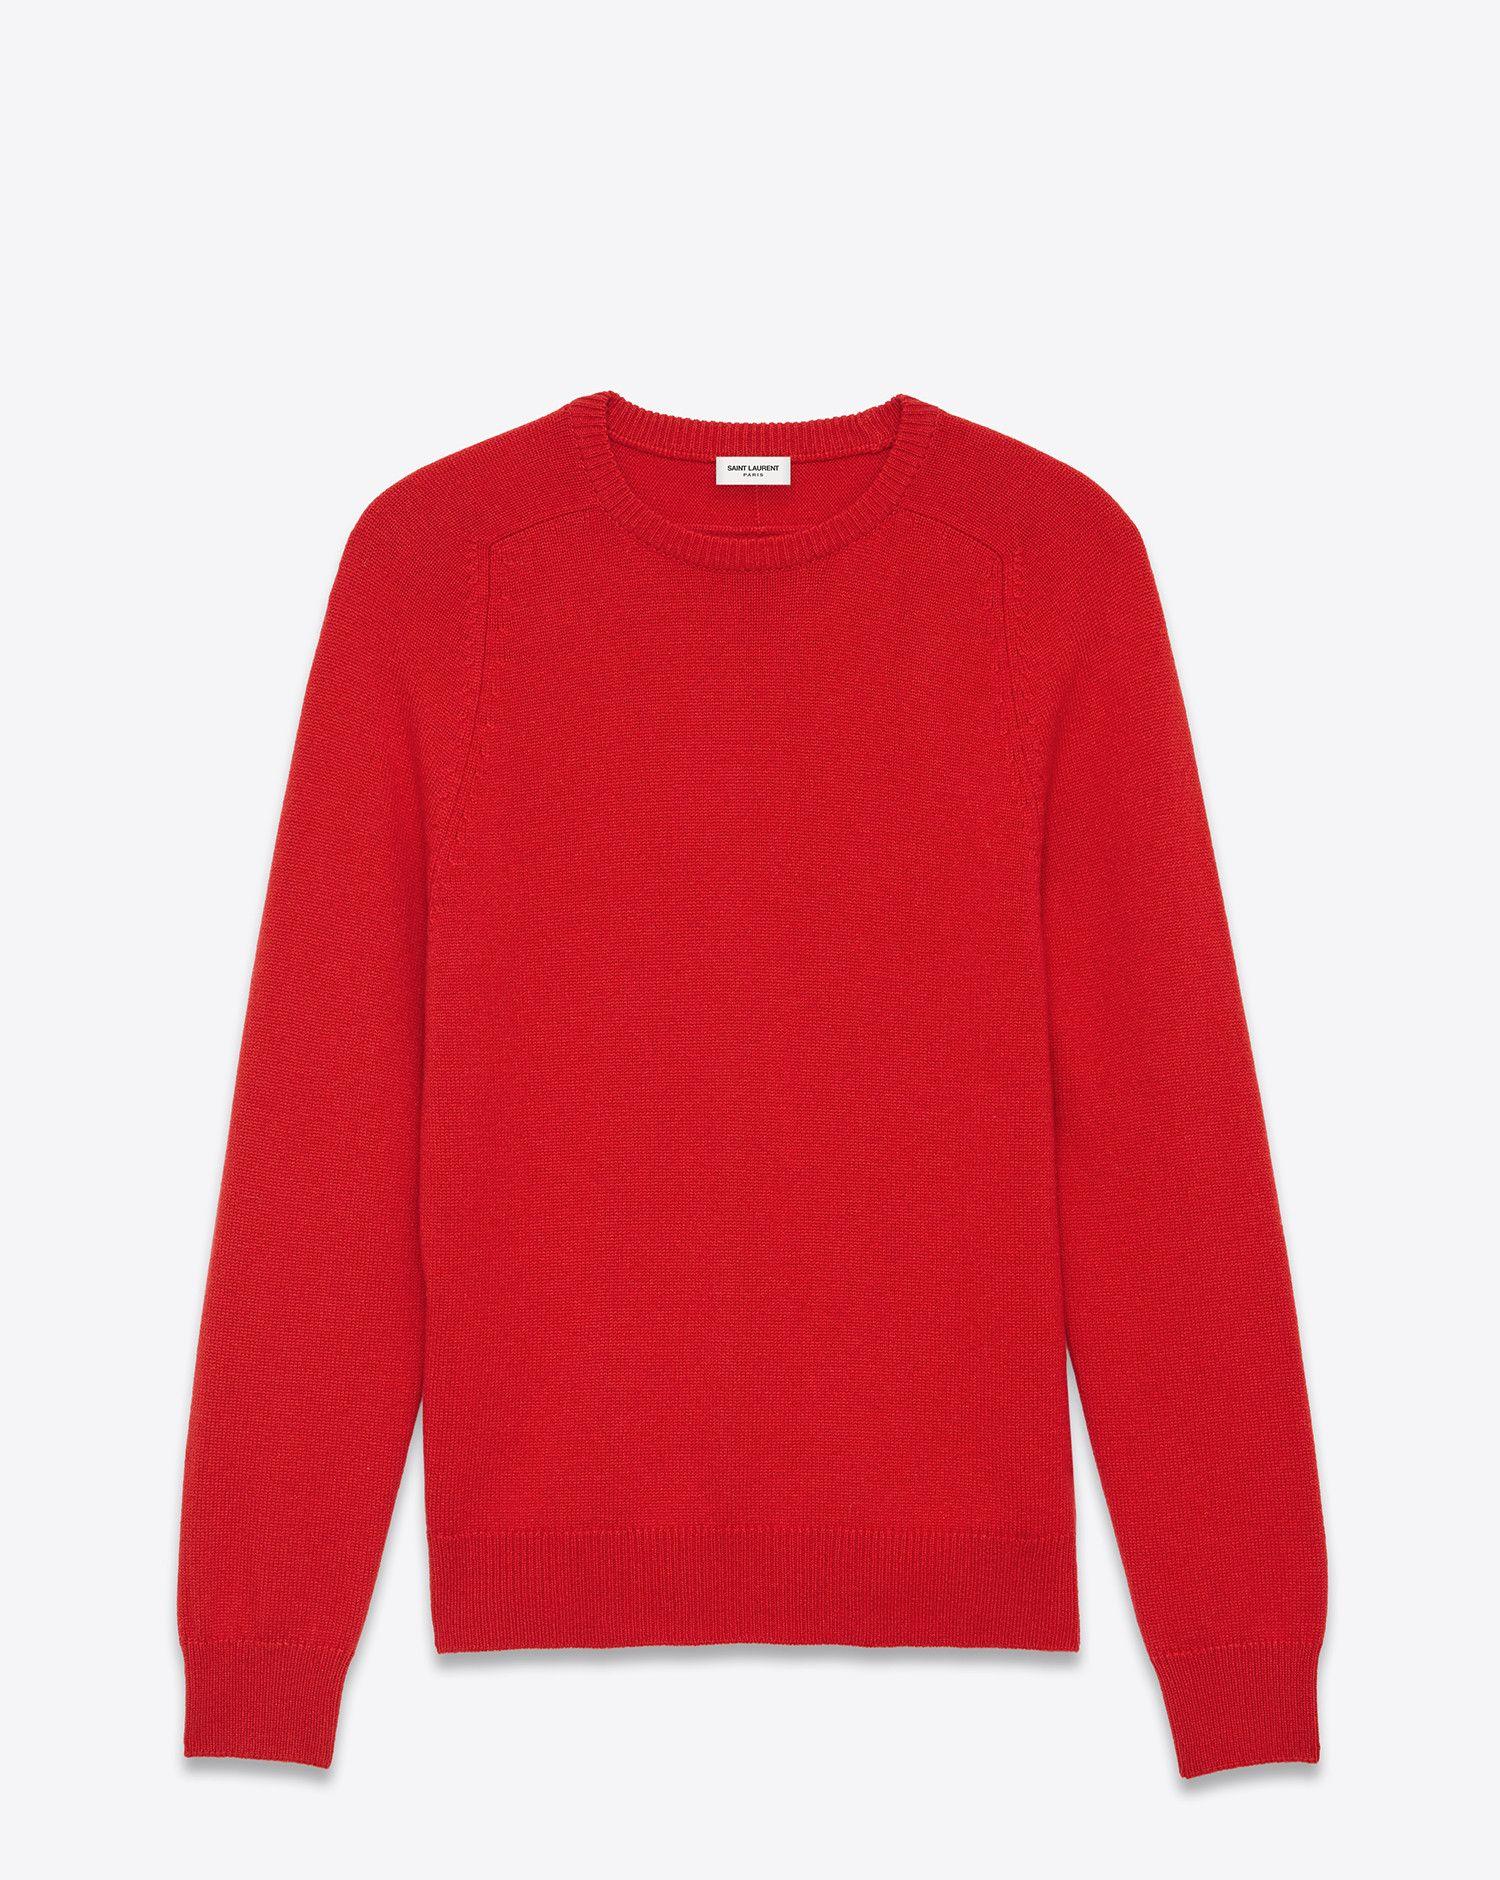 4f99fff2be6925 Saint Laurent Classic SAINT LAURENT Crewneck Sweater In Red Cashmere $990,  sold out.